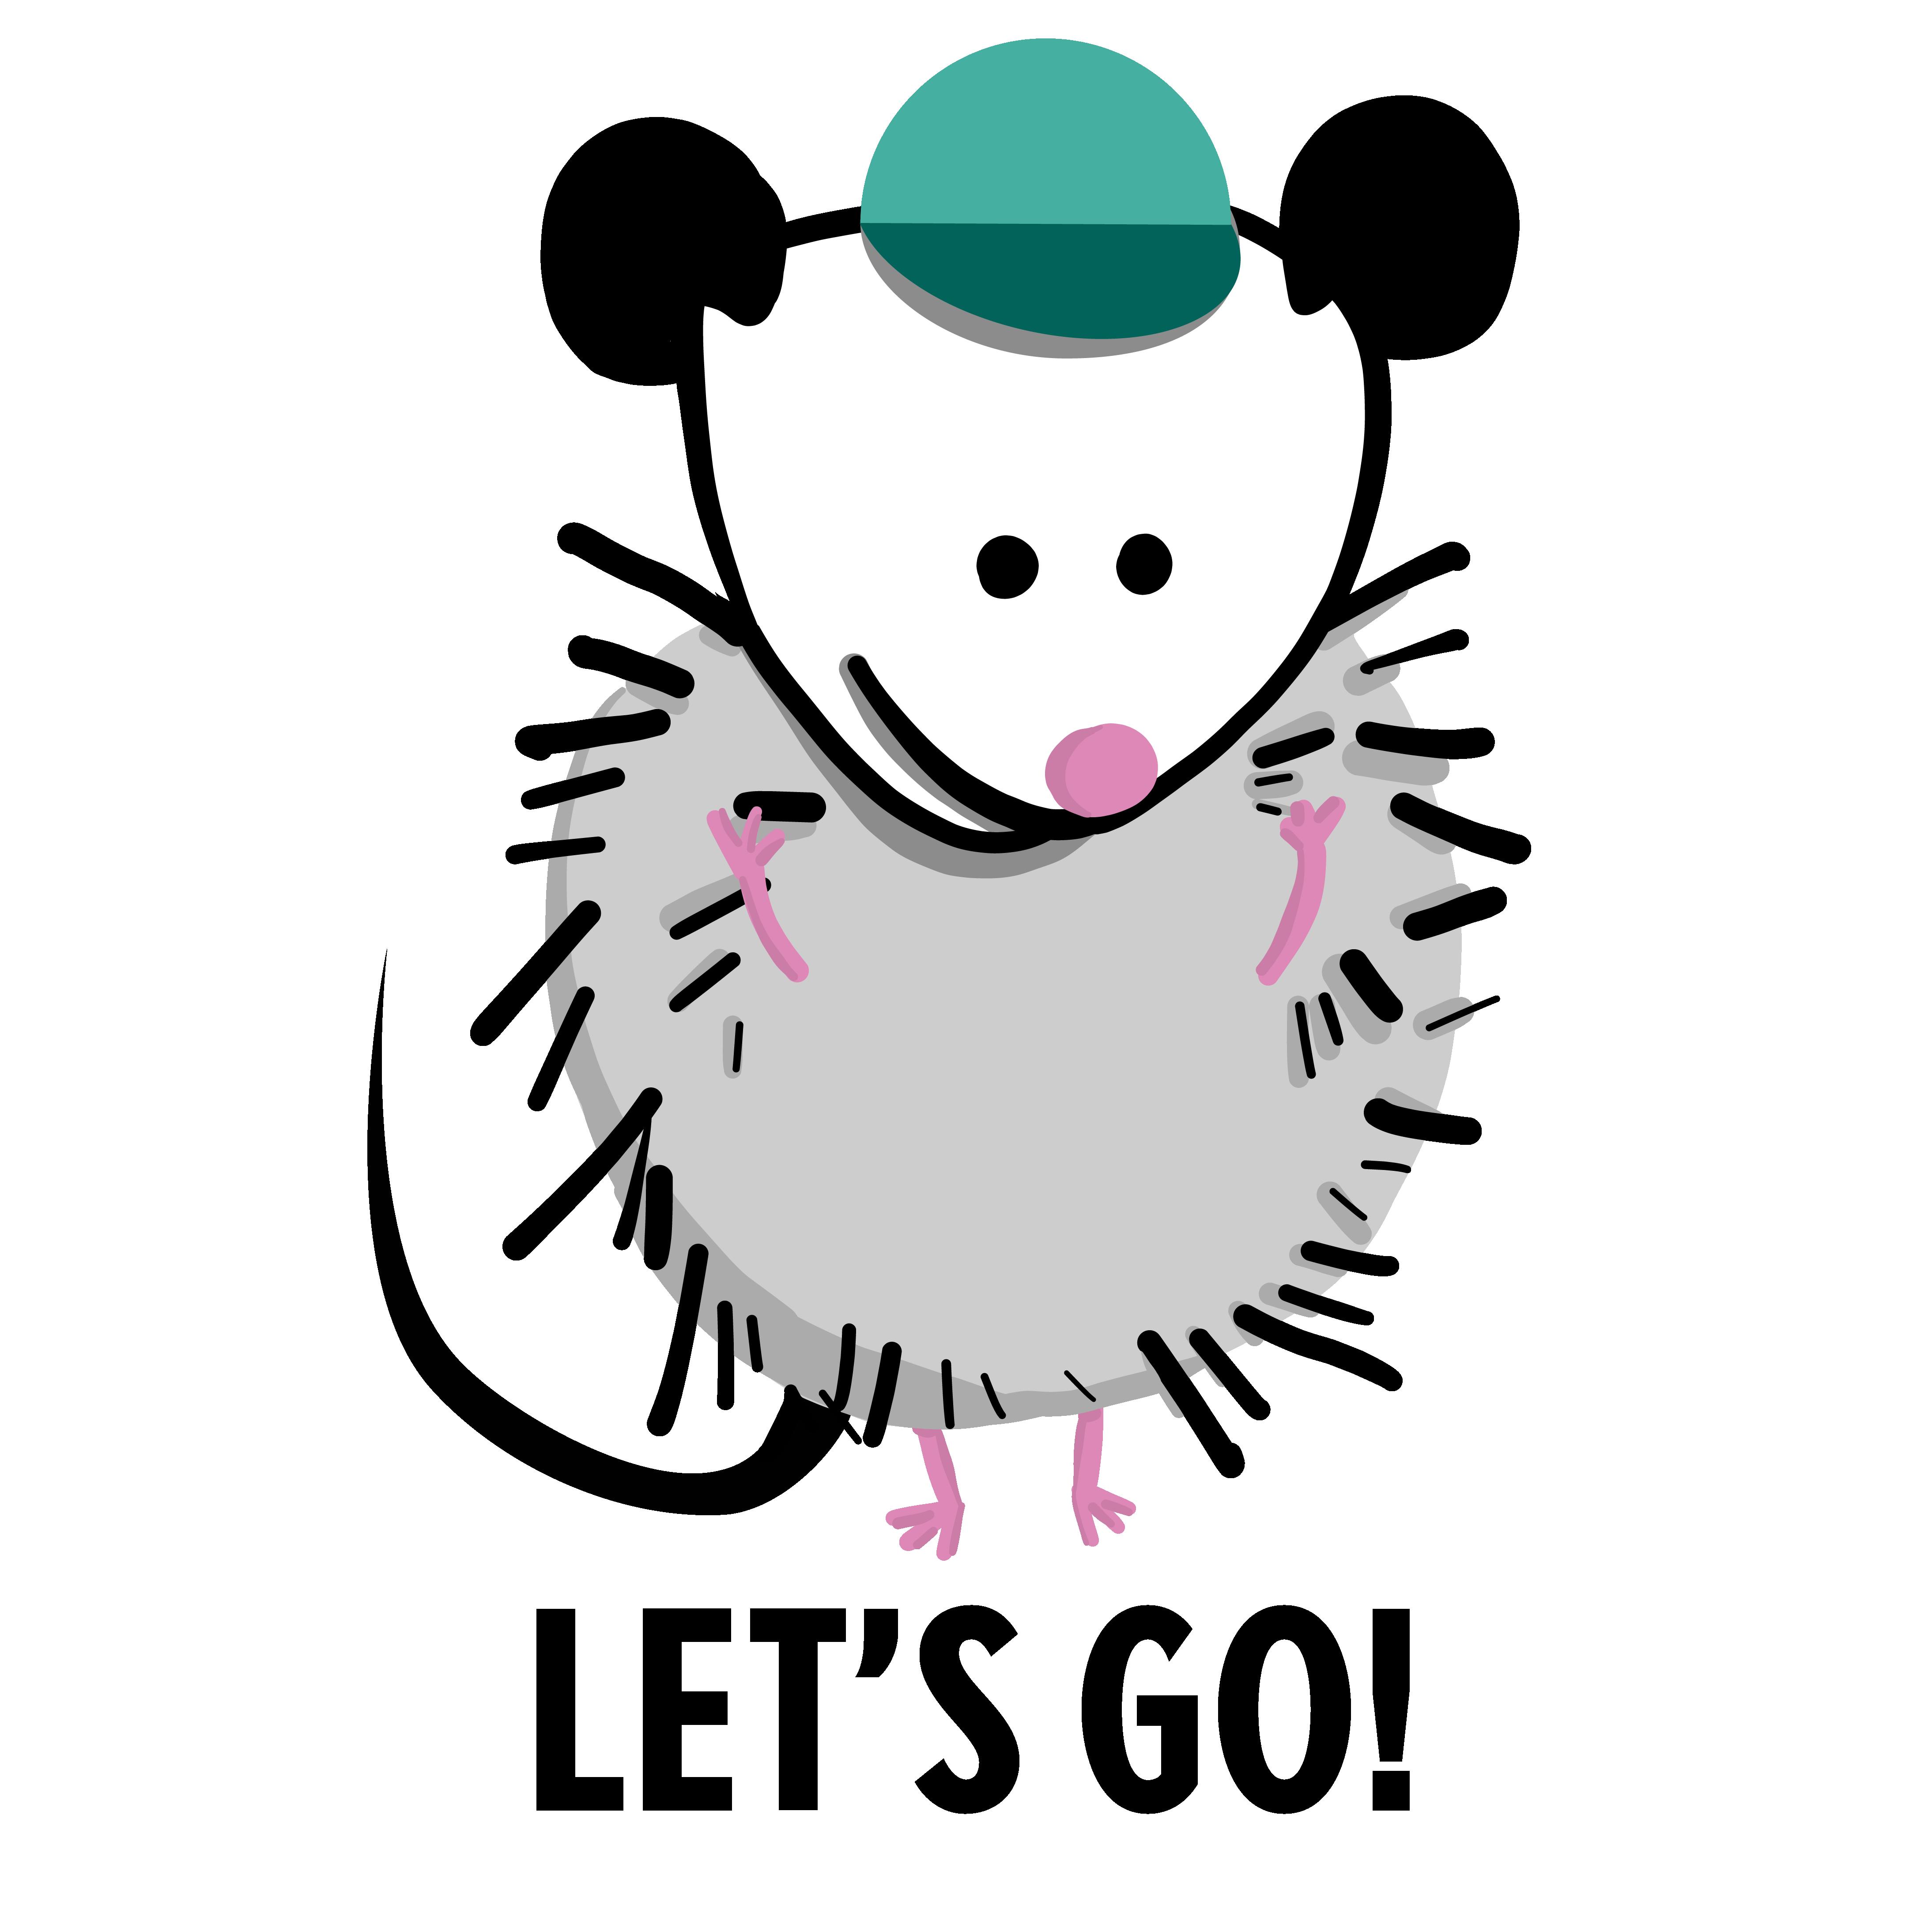 Baby Petunia messages sticker-3